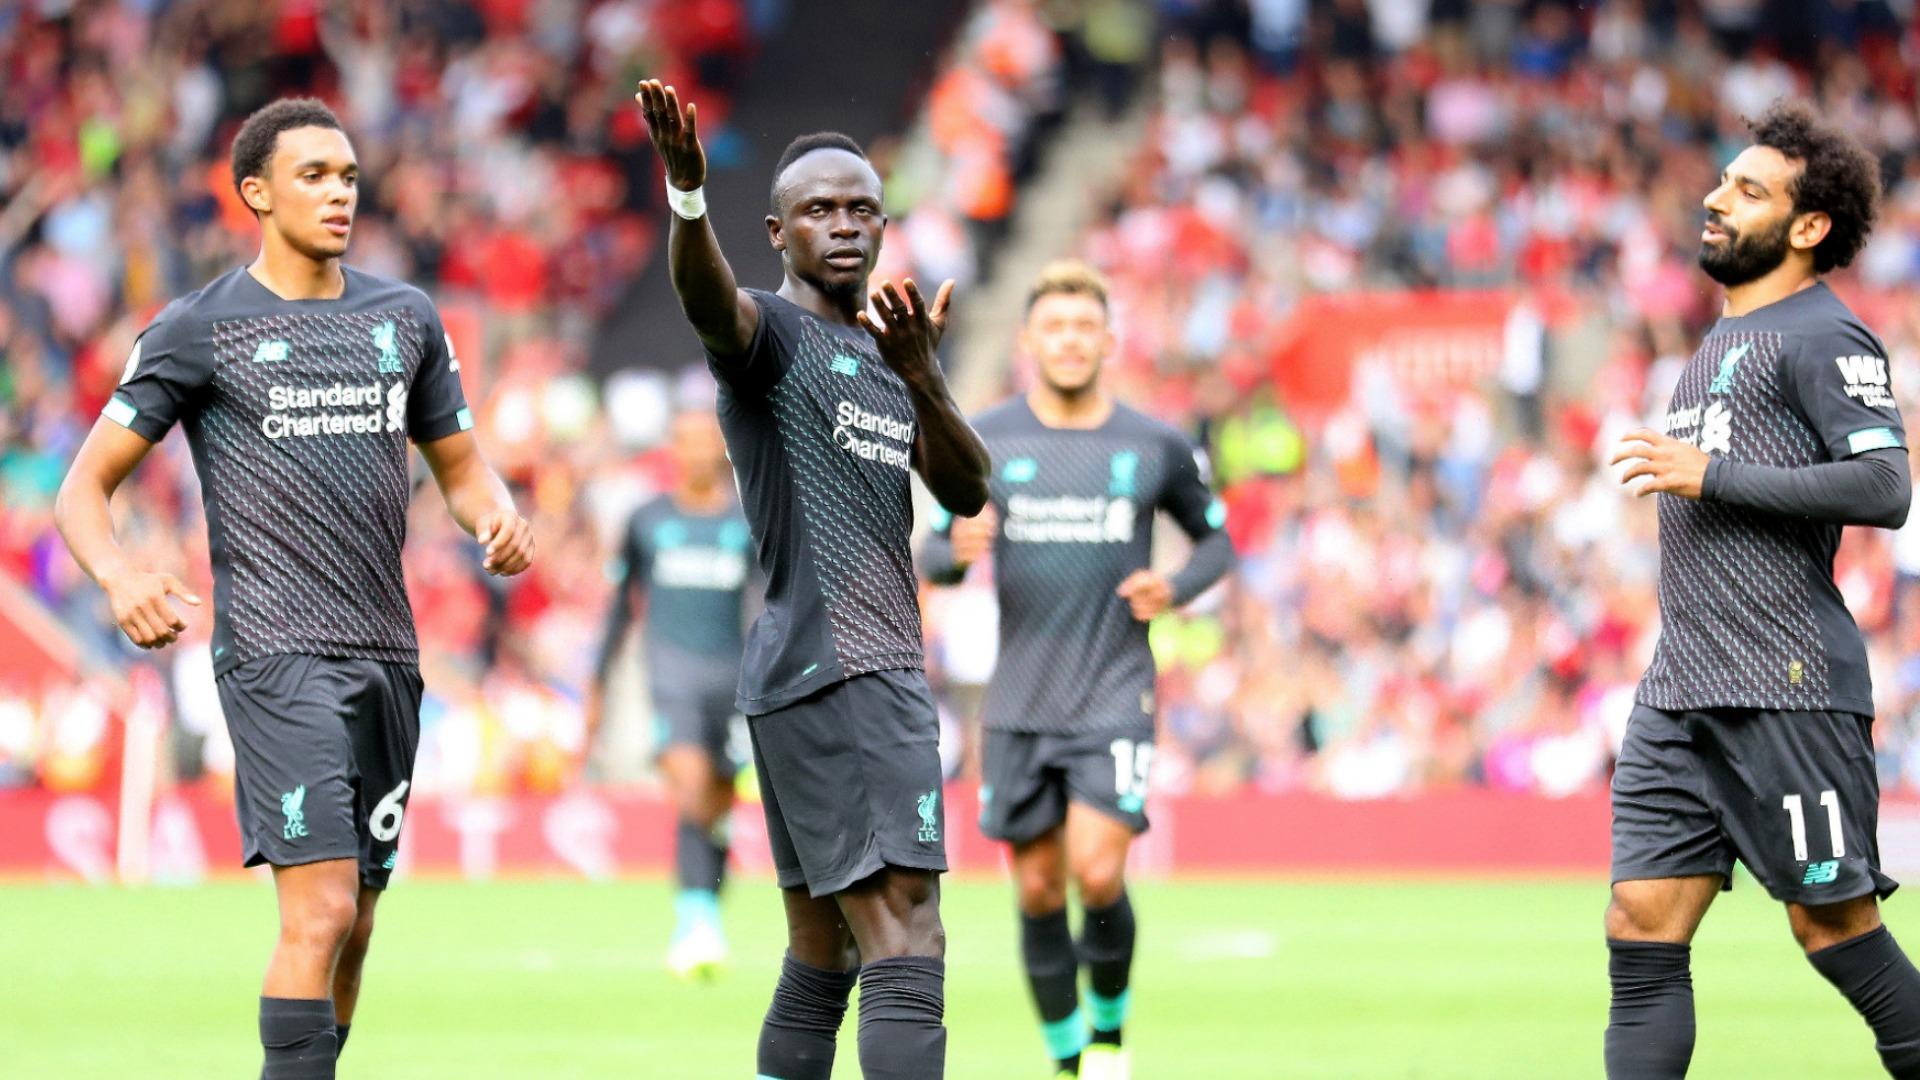 Southampton 1-2 Liverpool: Reds keep winning despite late Adrian error